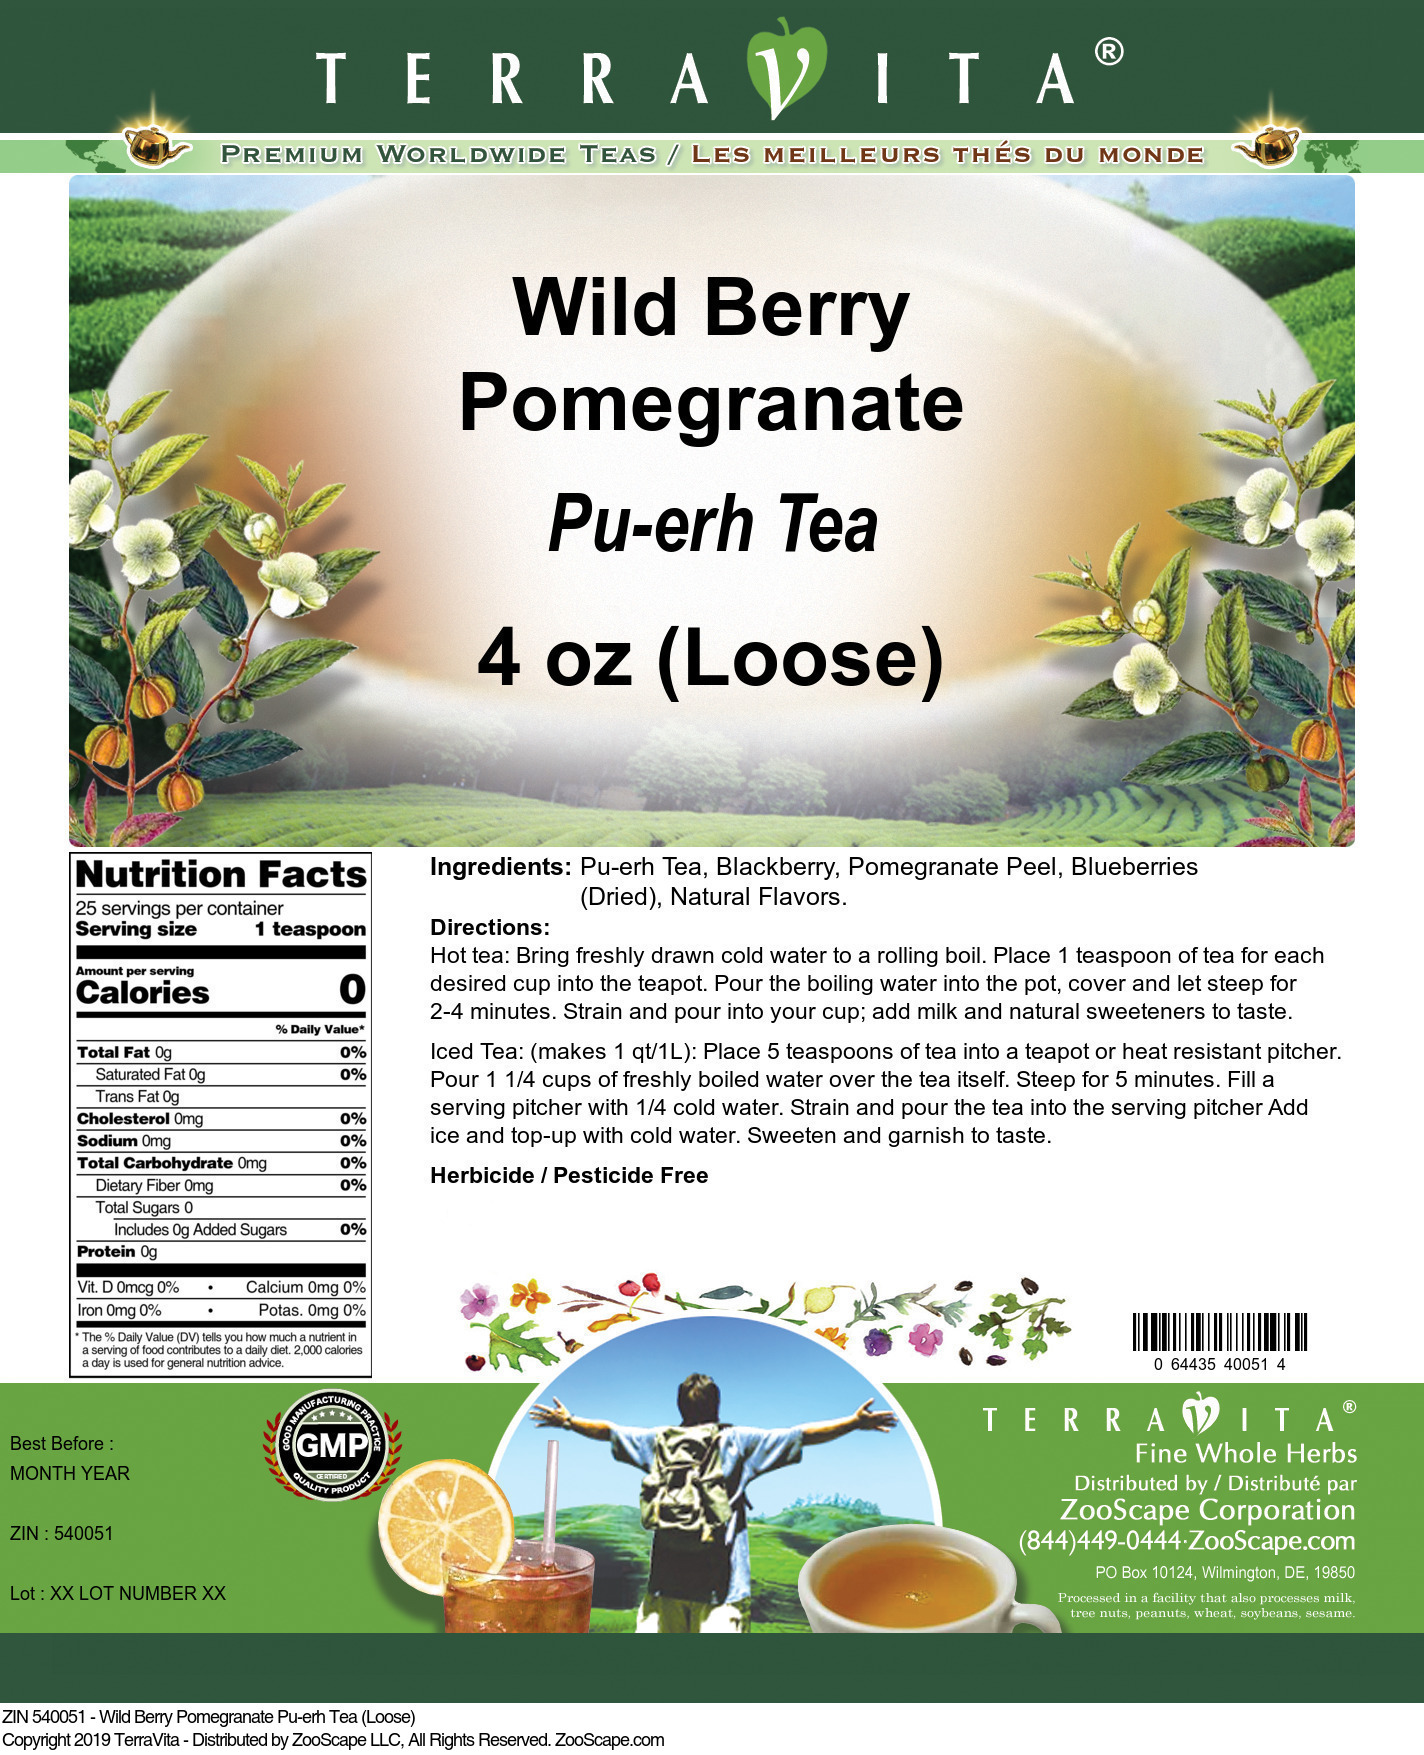 Wild Berry Pomegranate Pu-erh Tea